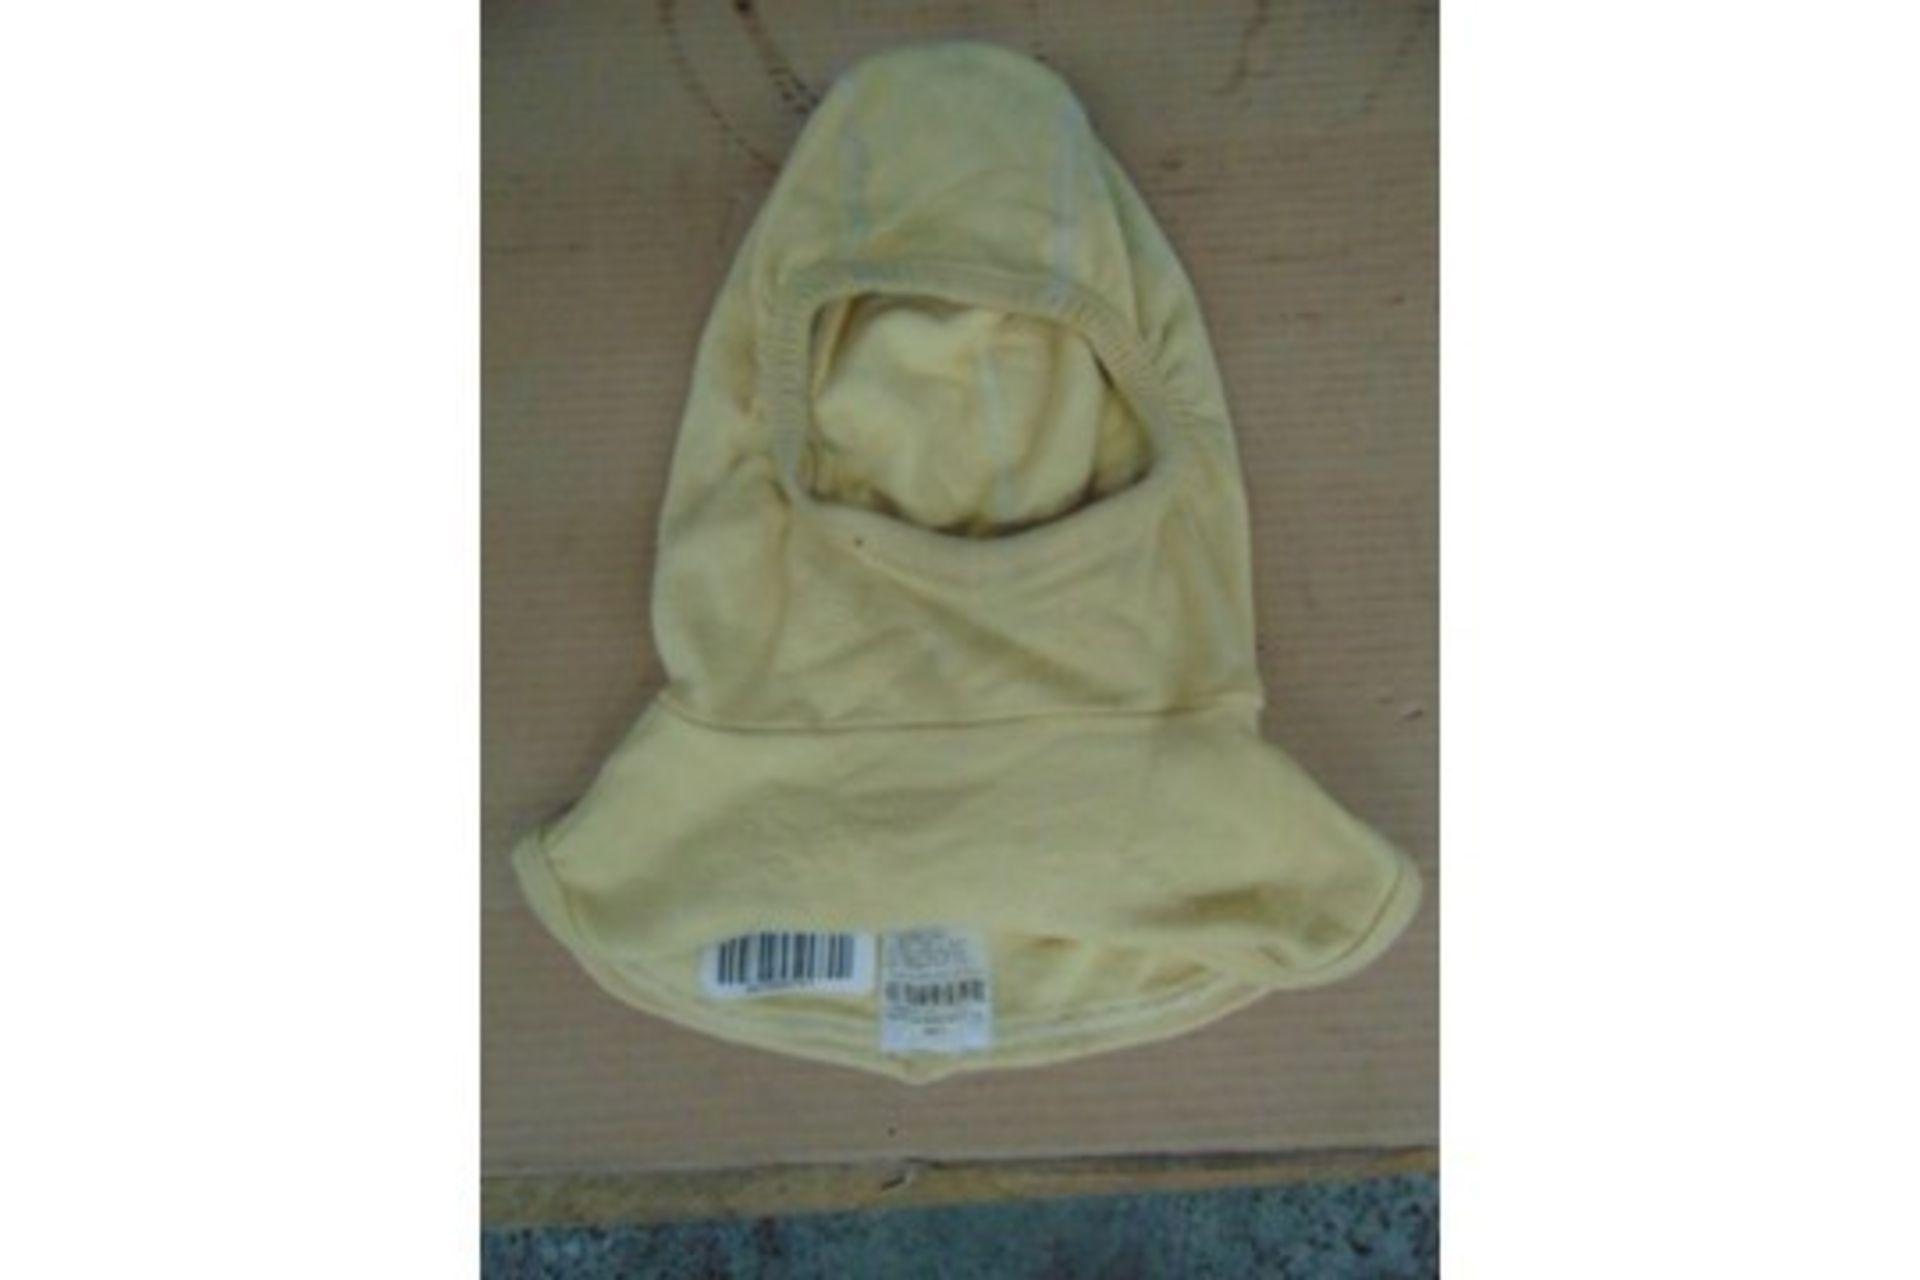 Lot 26795 - 50 x Anti-Flash Hoods